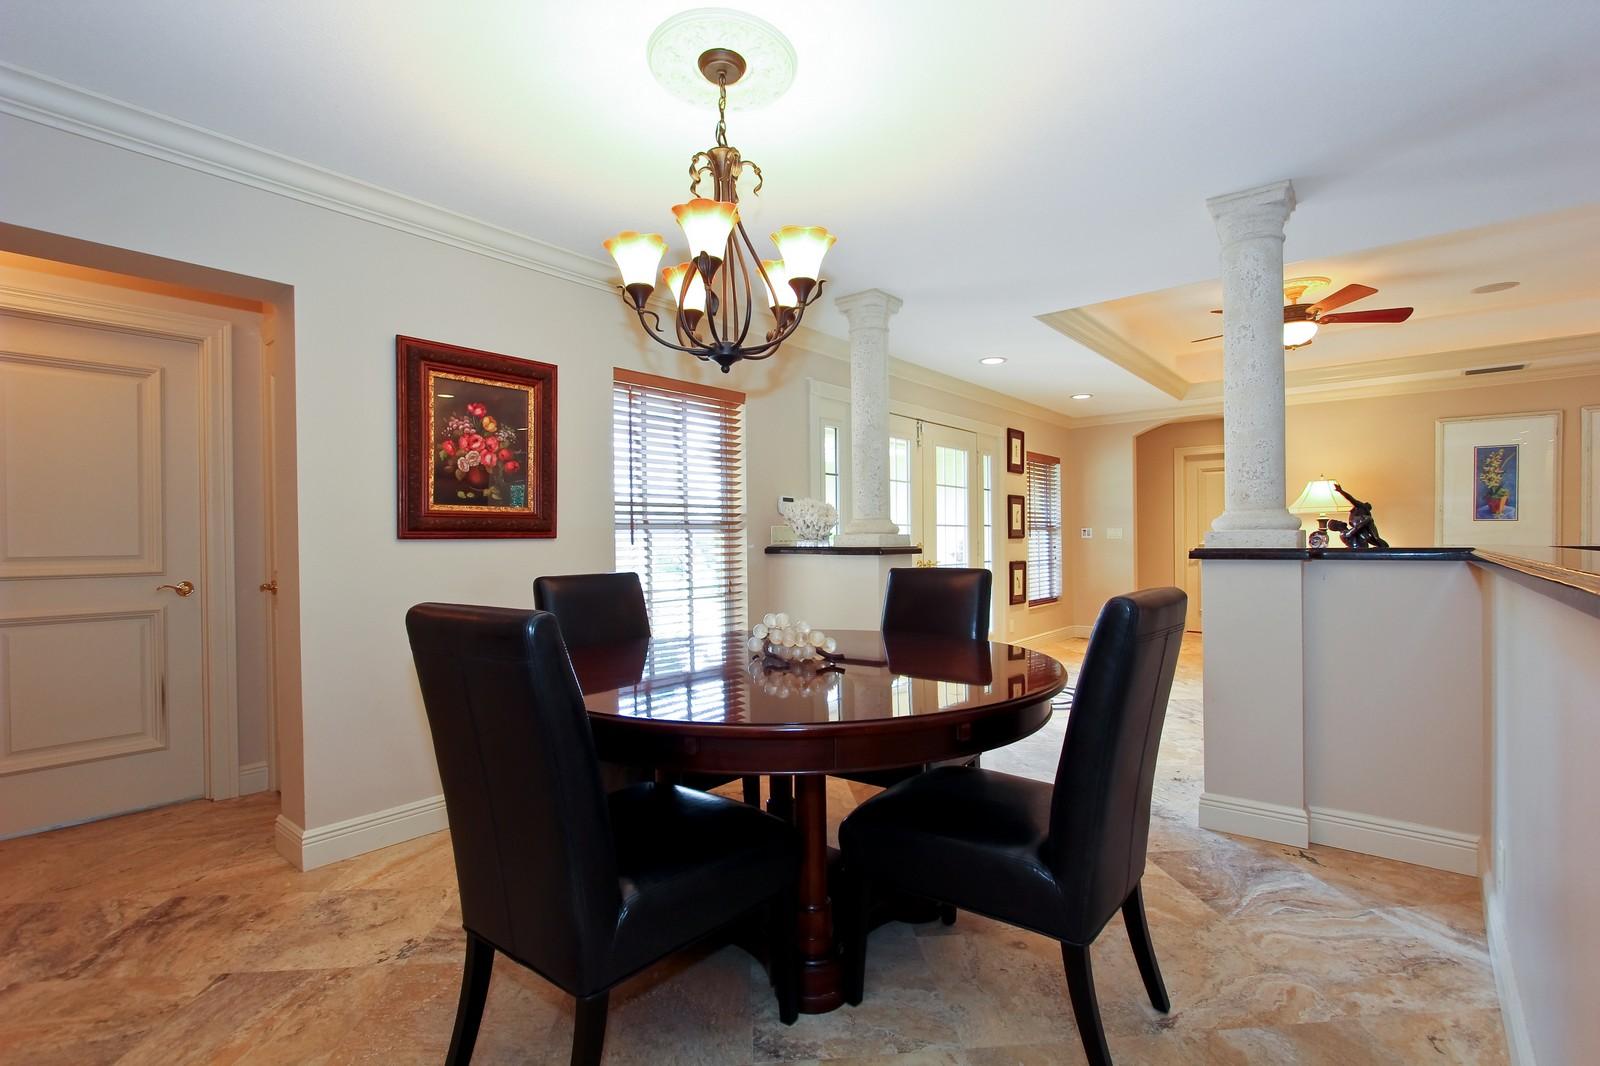 Real Estate Photography - 430 N. Lyra Circle, Juno Beach, FL, 33408 - Dining Room